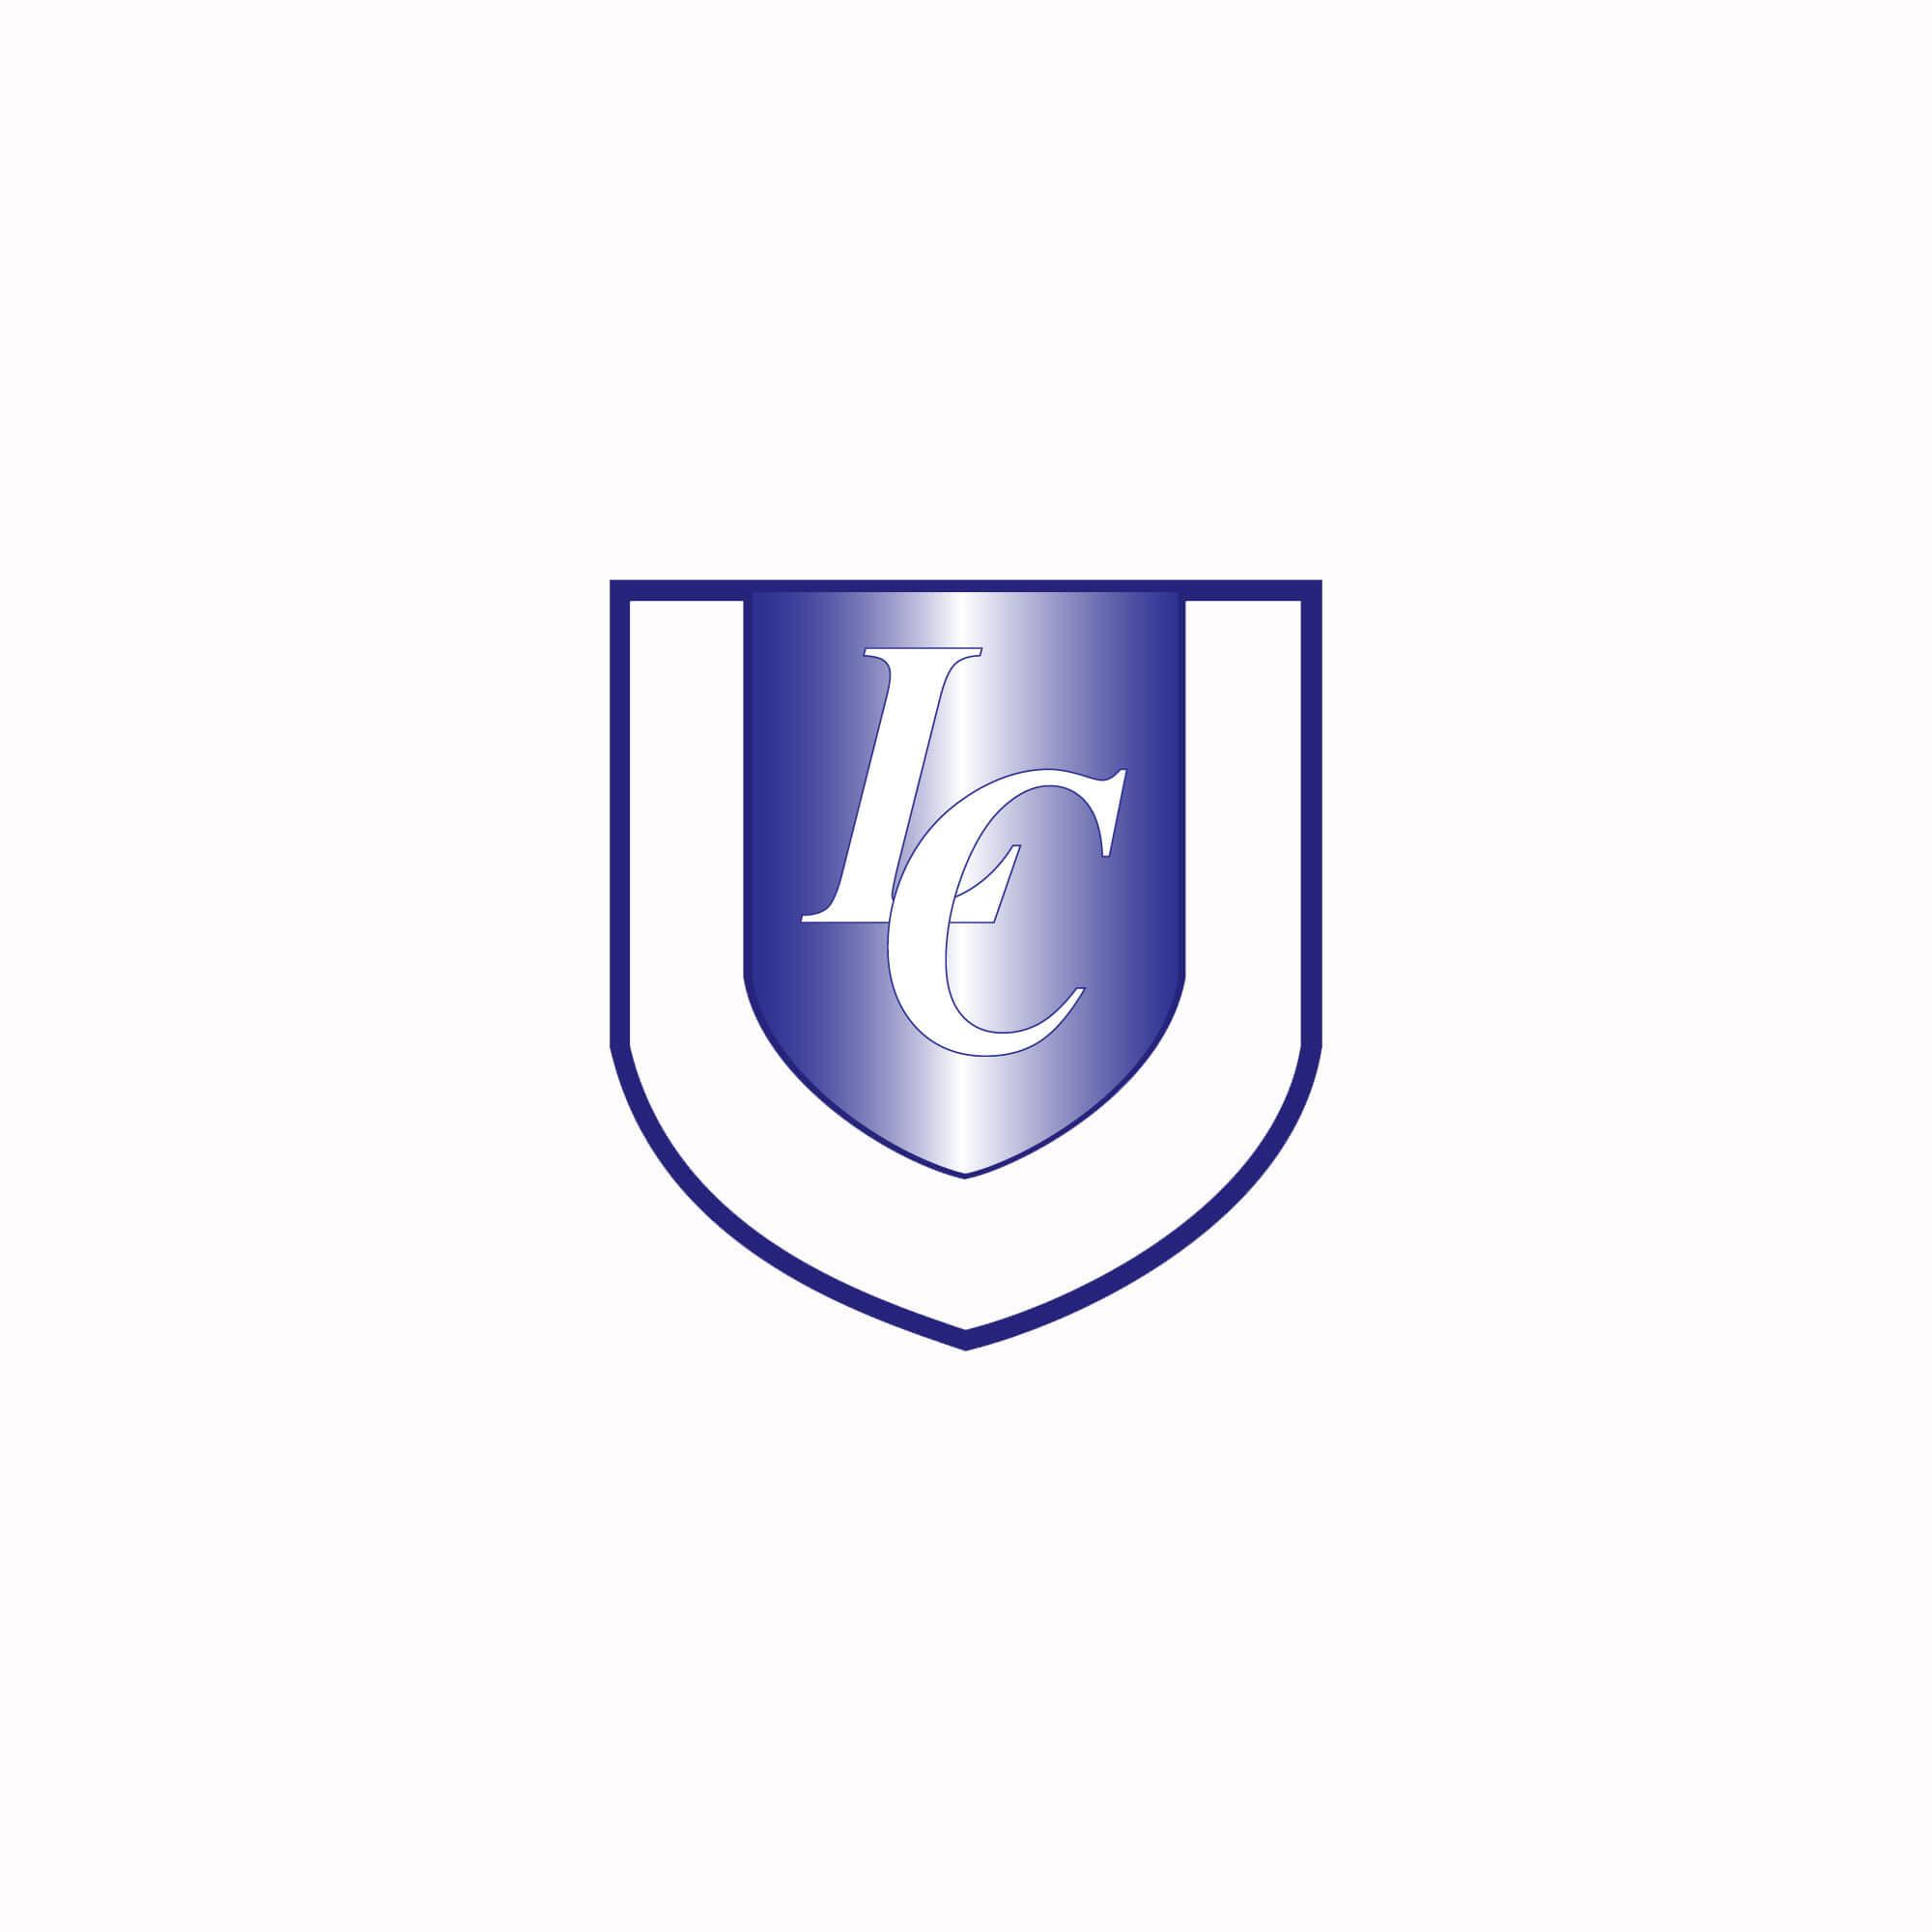 London College logo